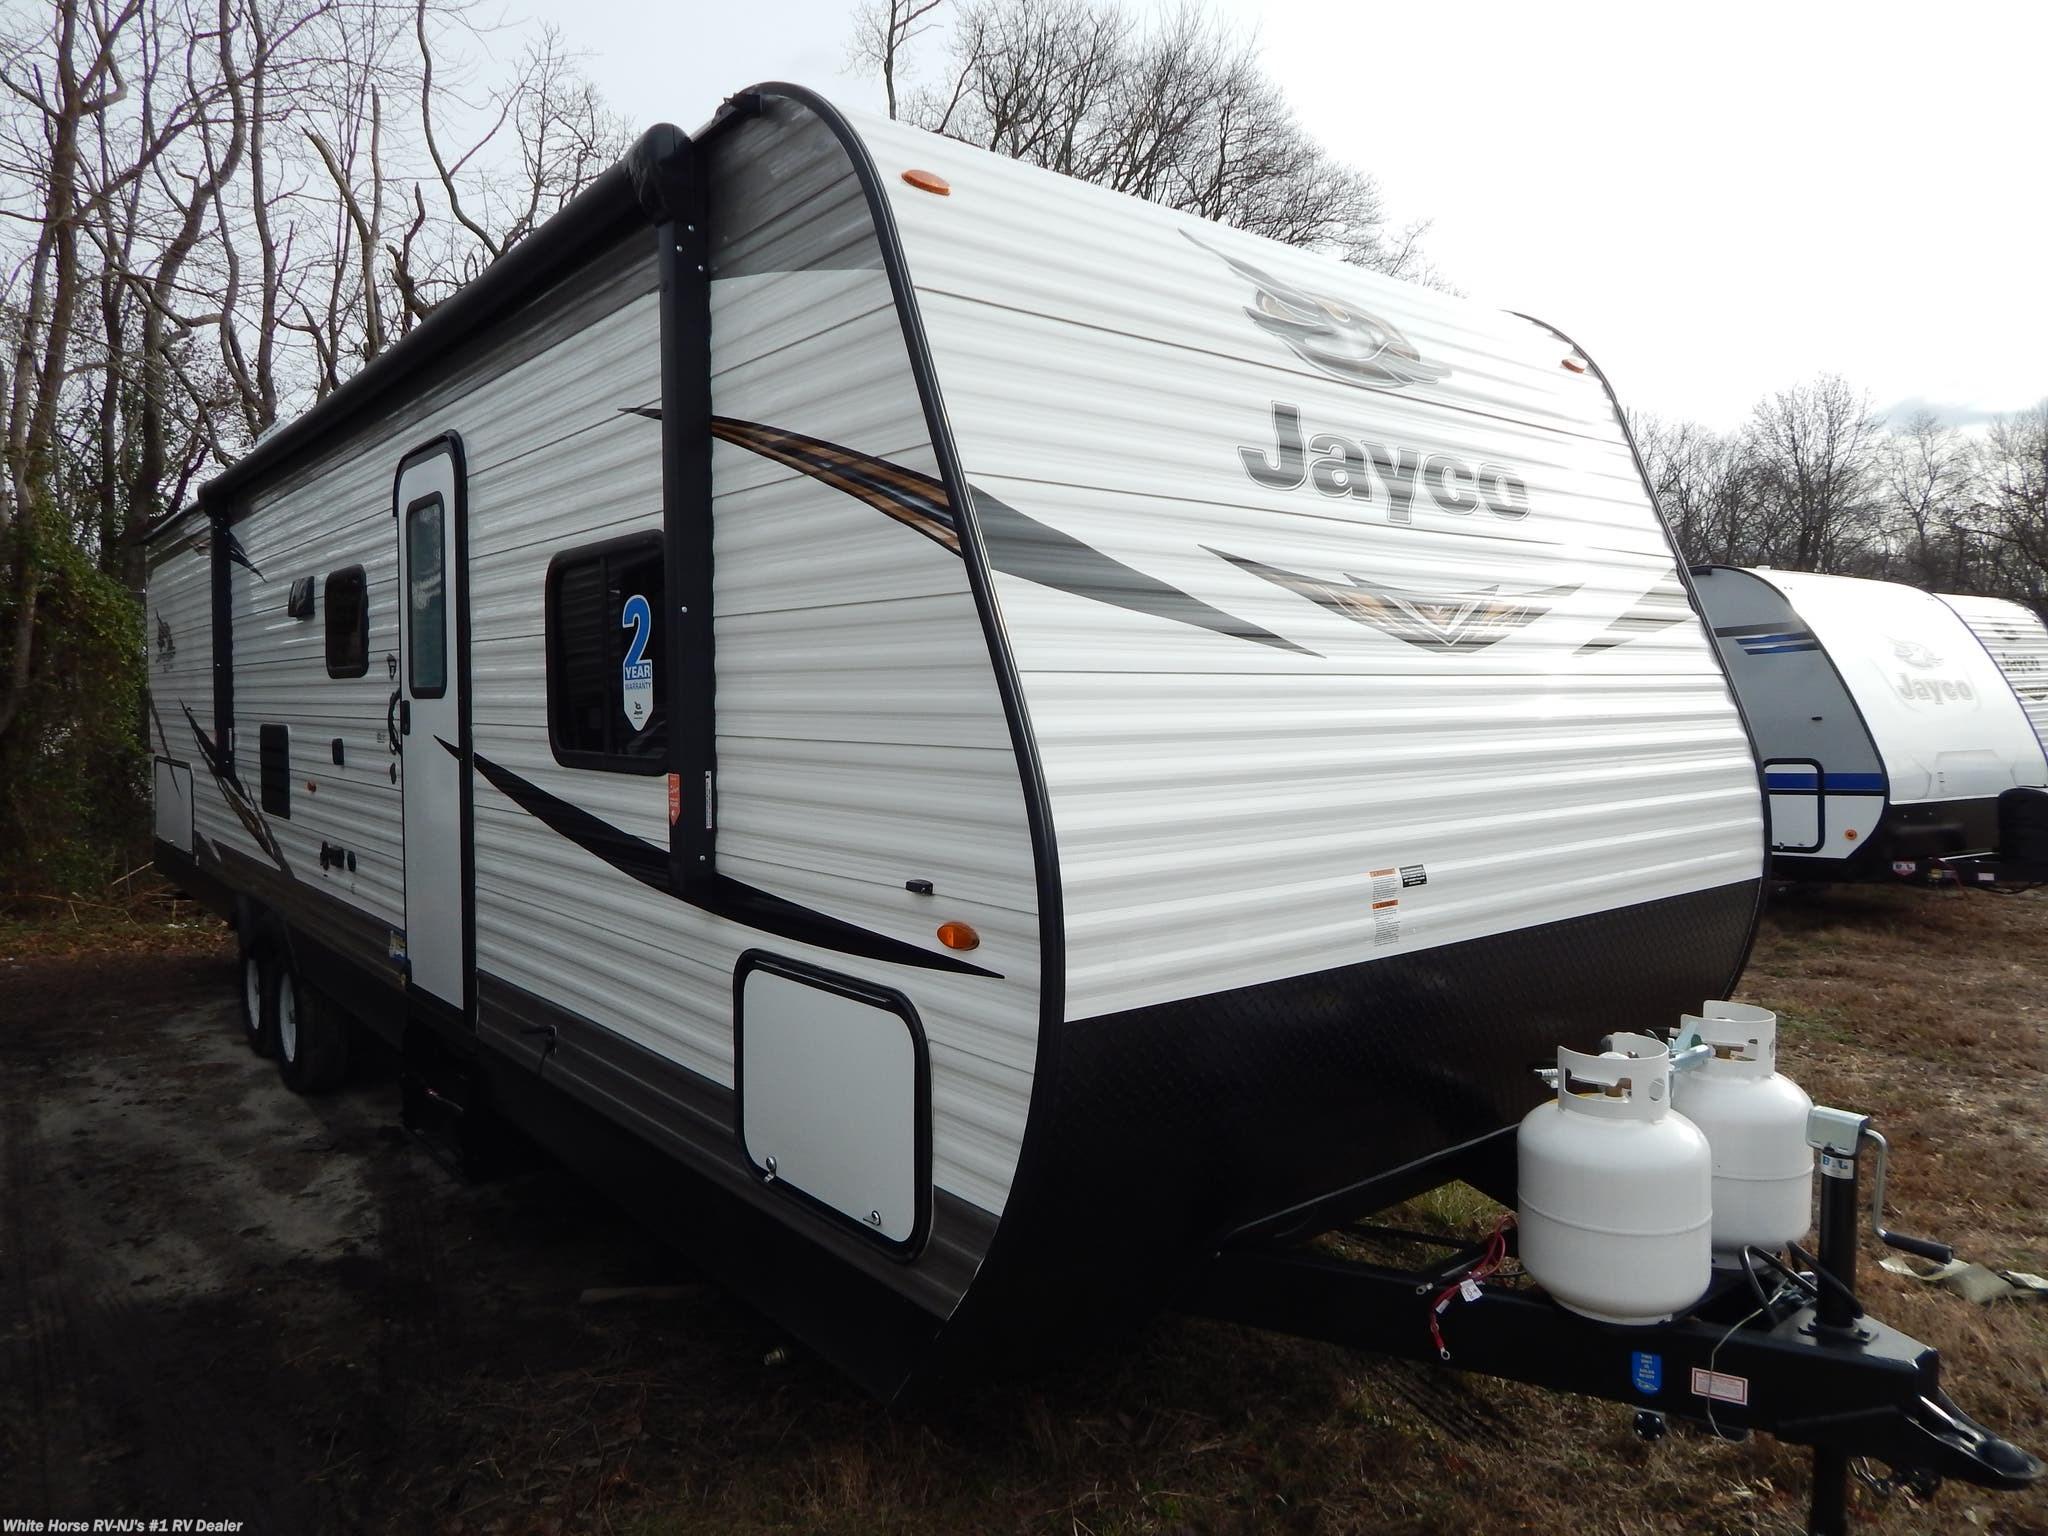 J12337 2019 Jayco Jay Flight Slx 294qbs 2 Bdrm Slide 4 Bunk Beds